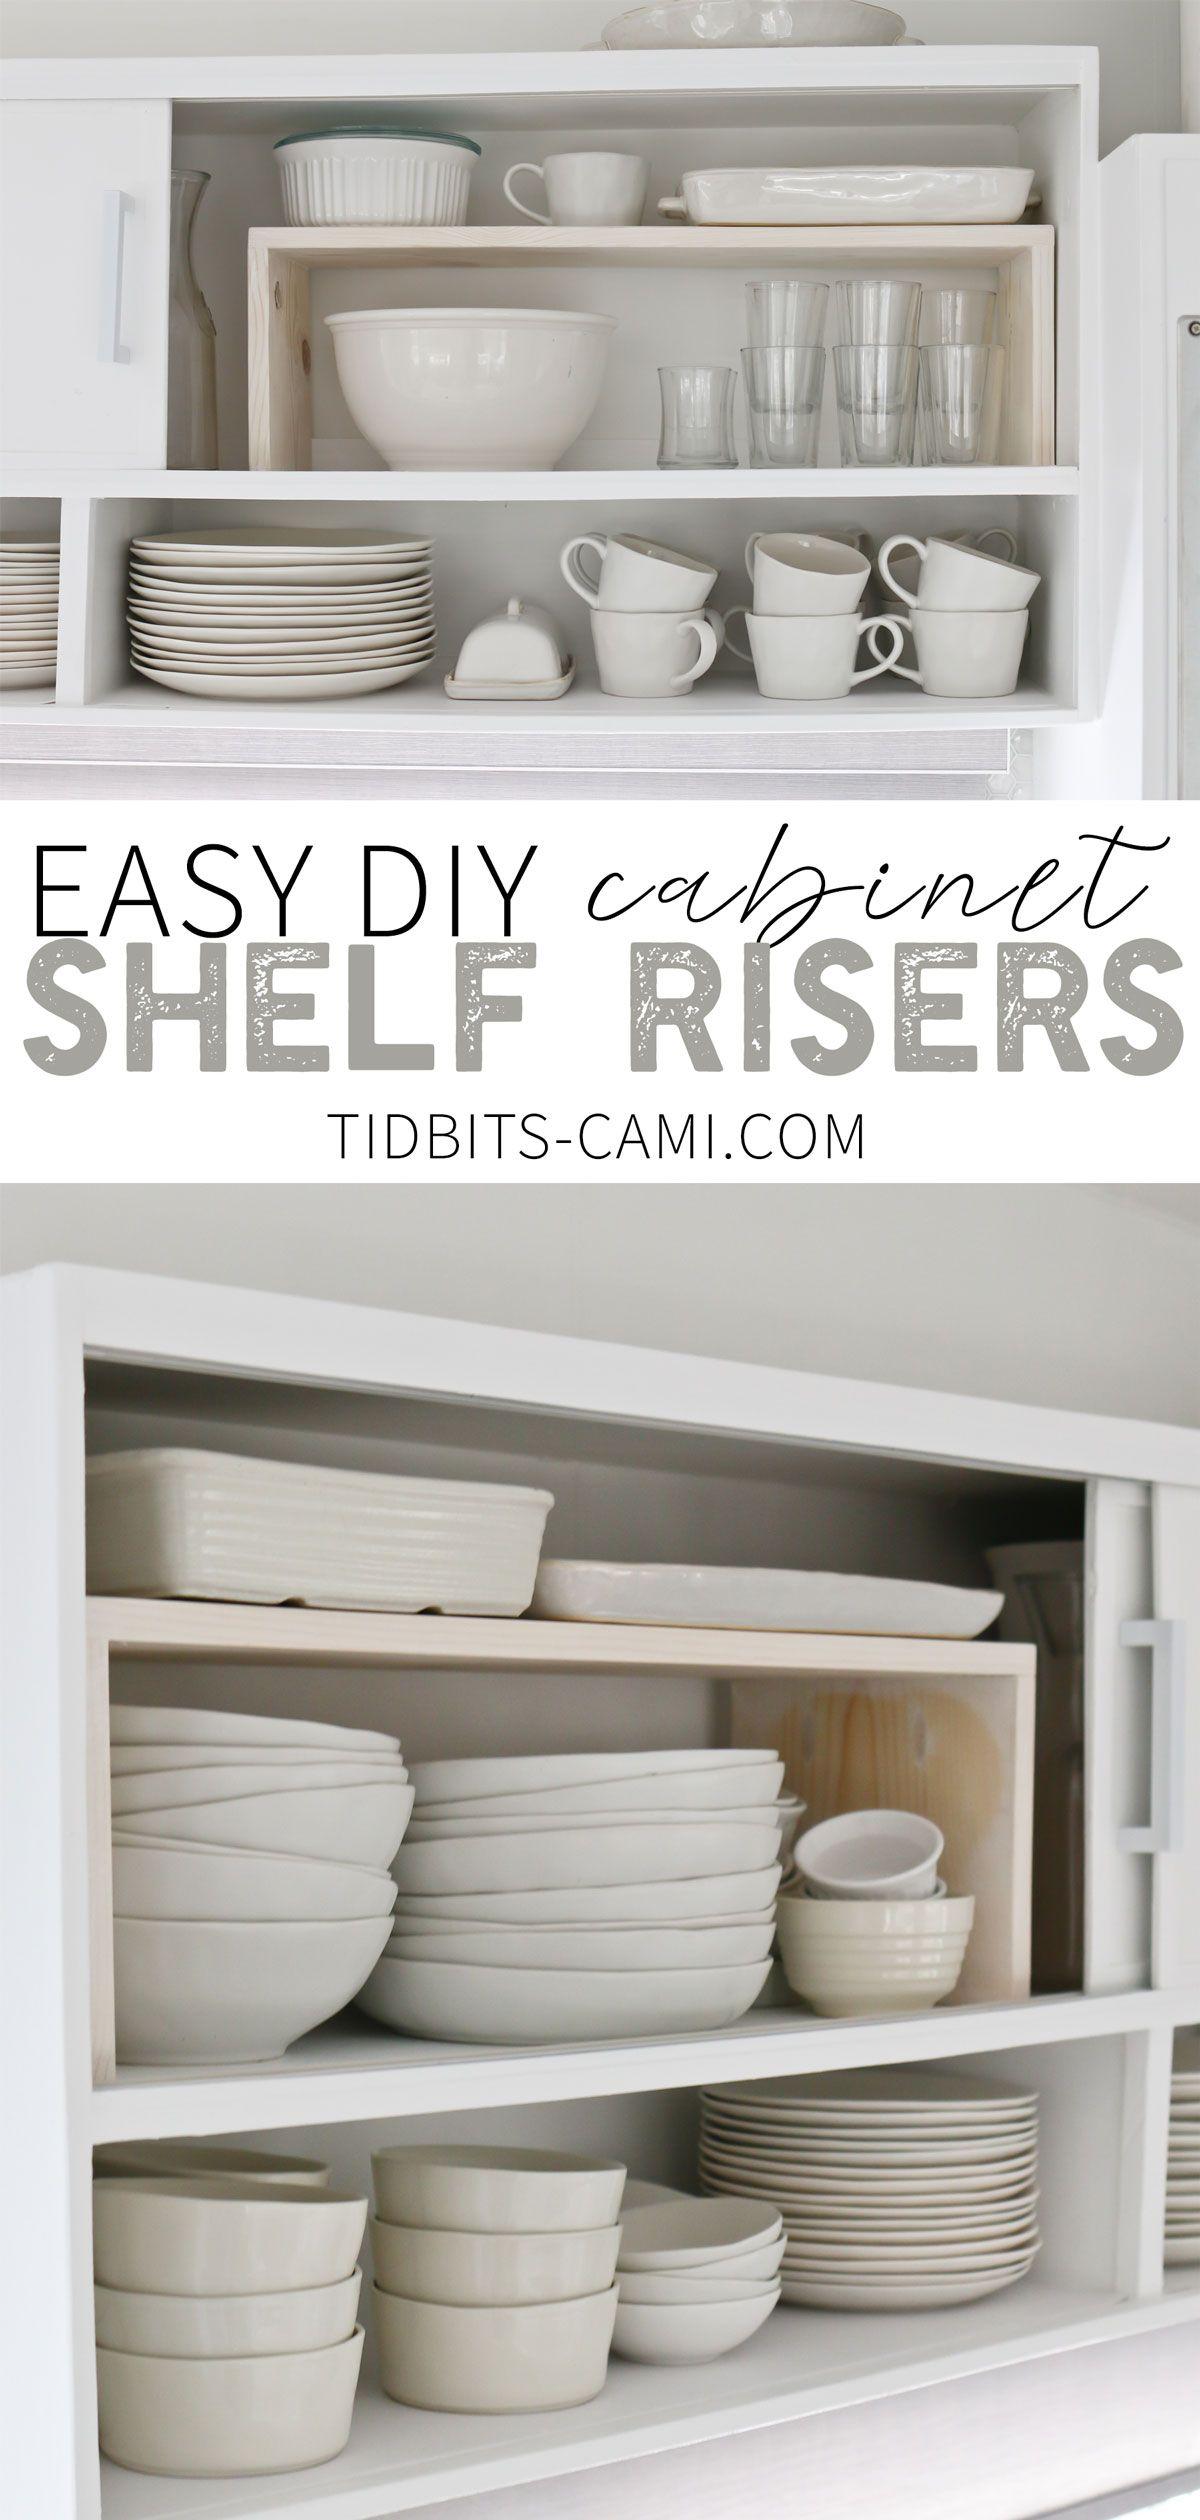 Easy Diy Cabinet Shelf Risers Diy Cabinets Diy Cupboards Shelves